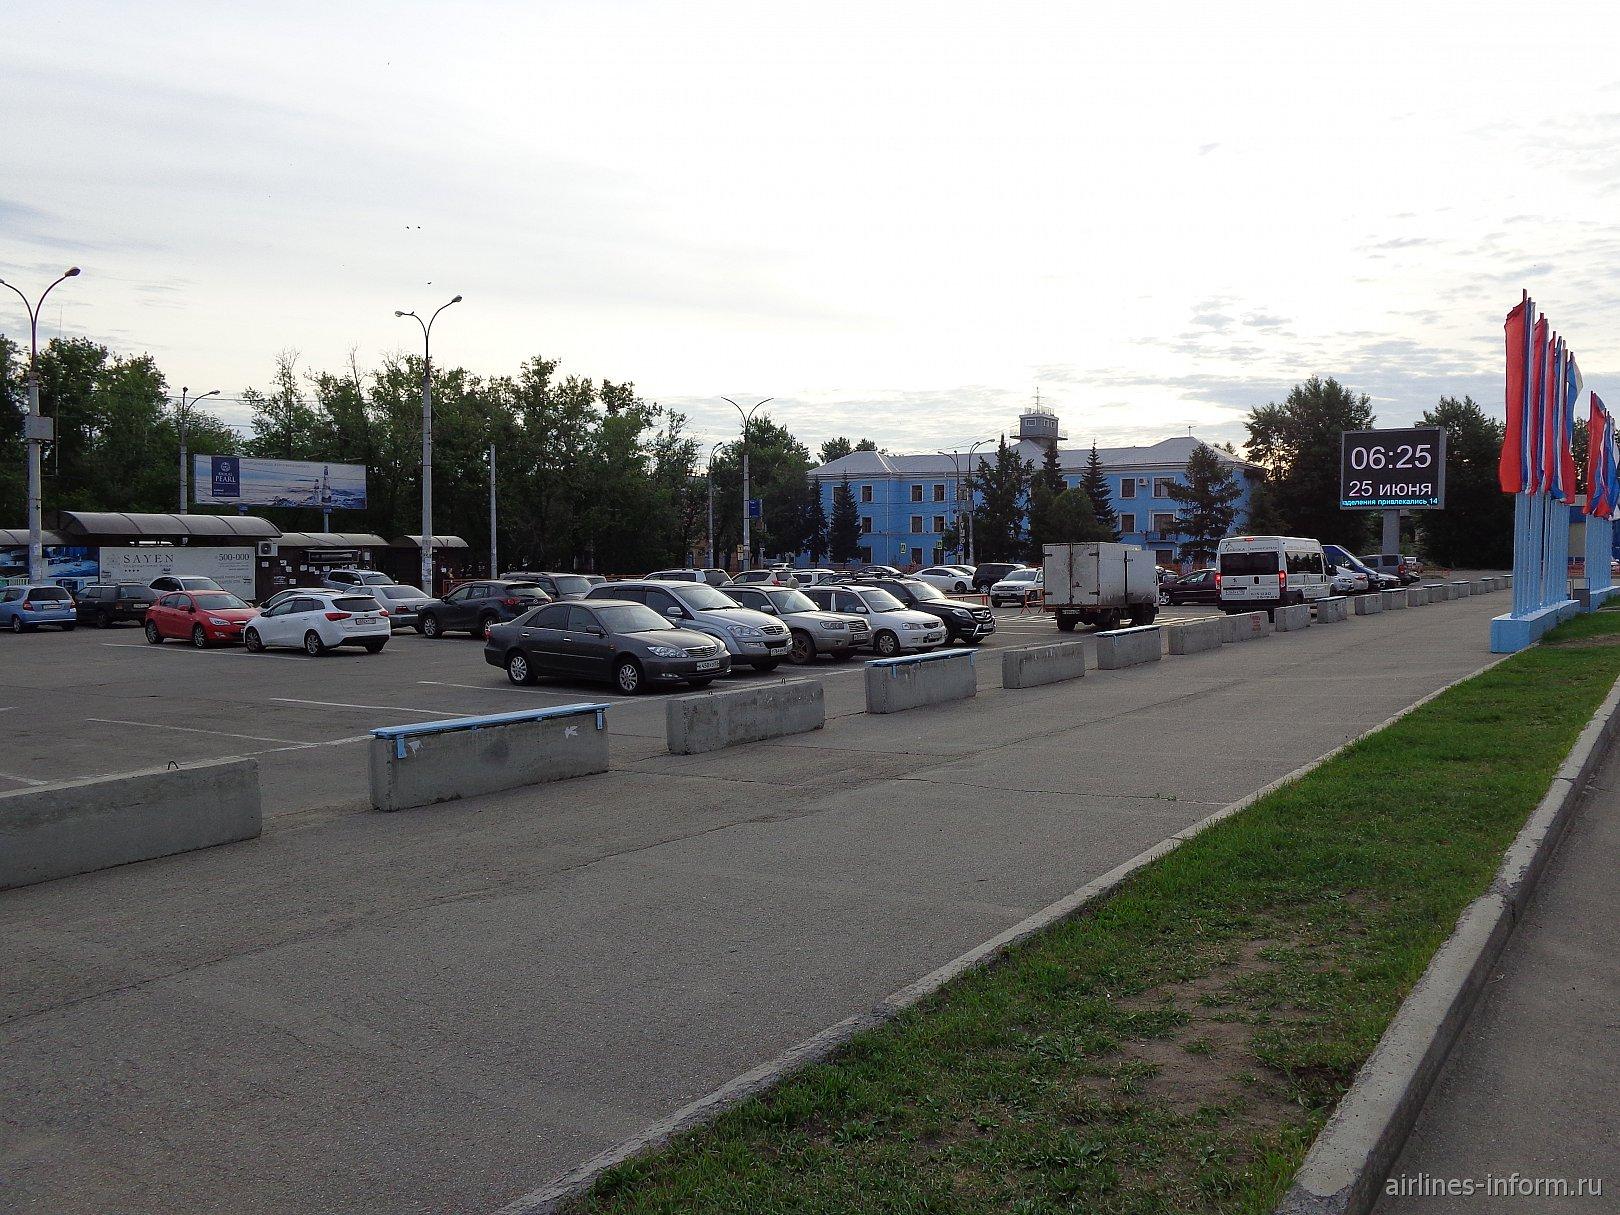 Парковка у термина международных линий